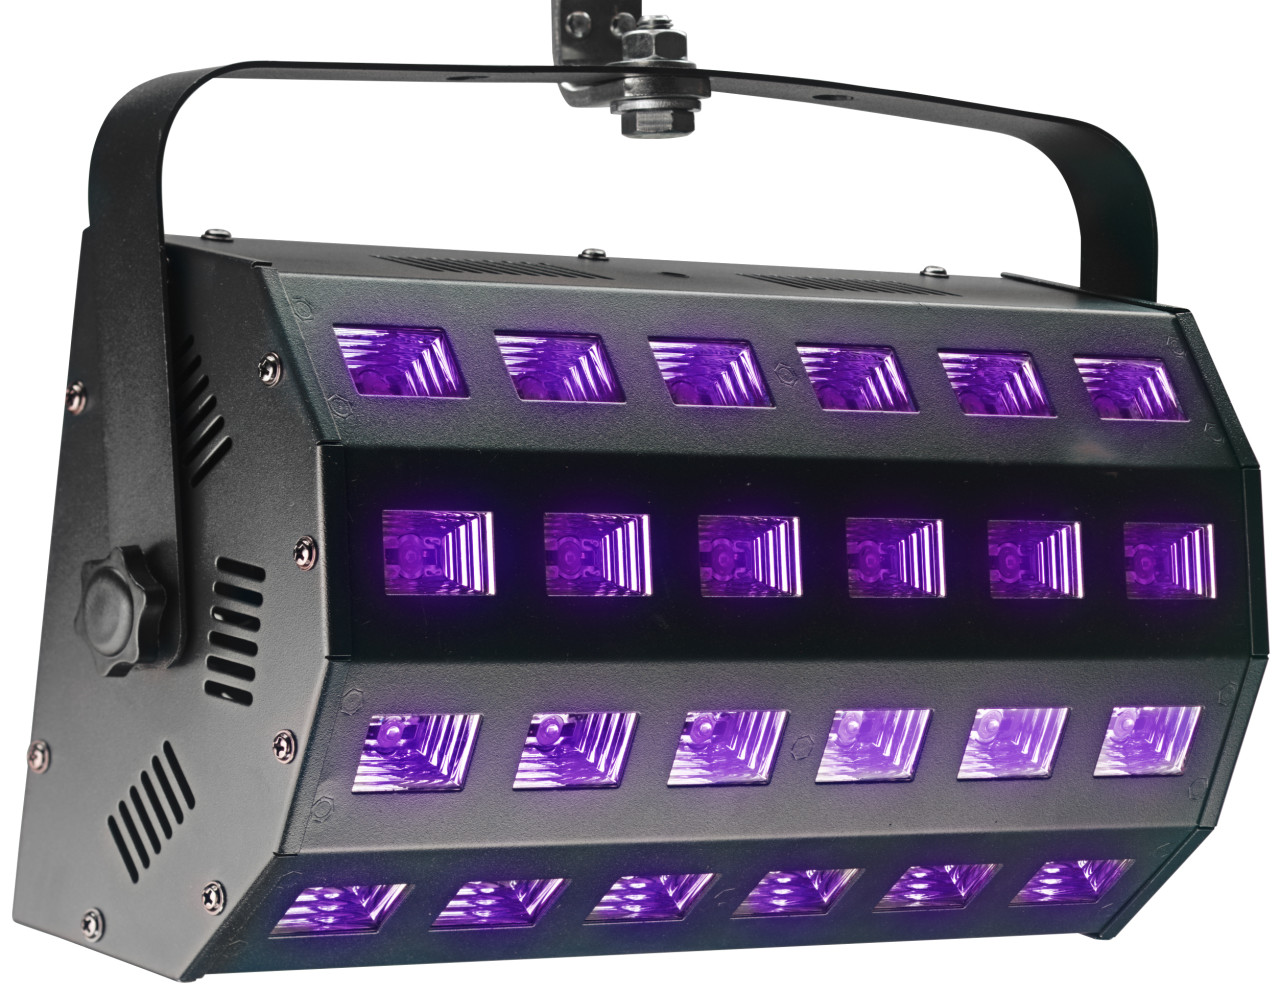 UV Washer, 24 x 3 watts, 65°, DMX